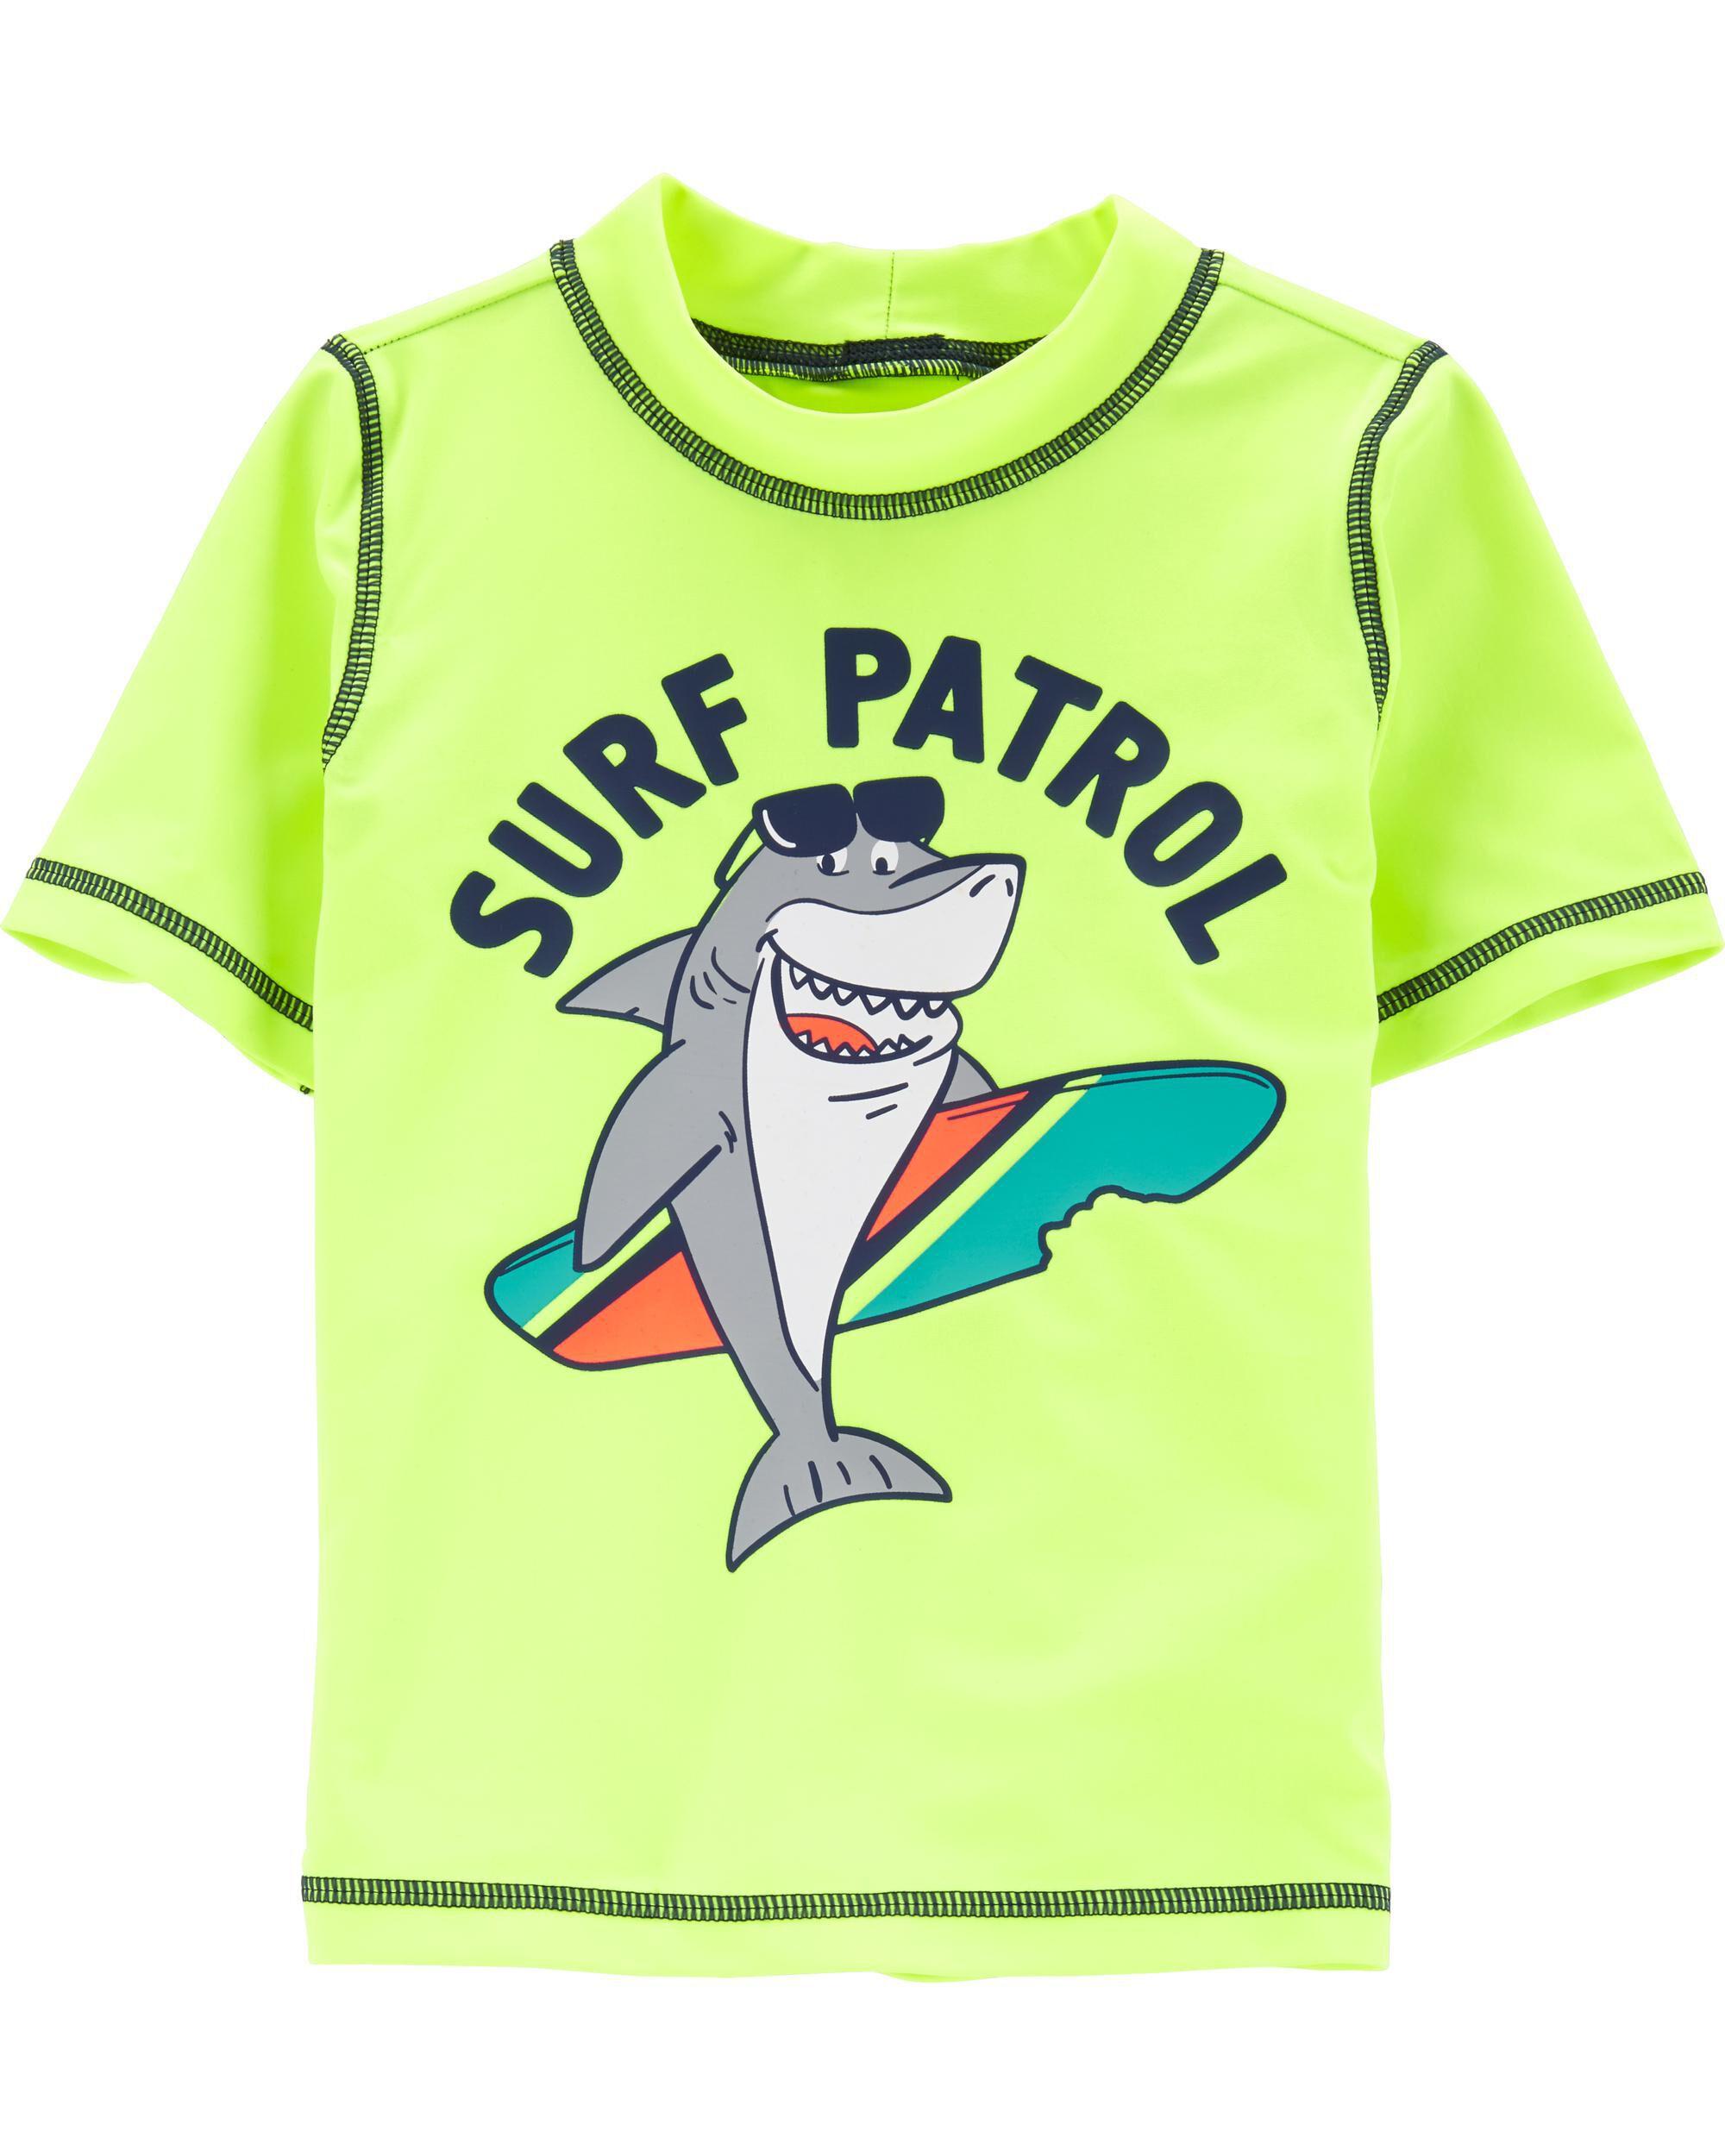 *Clearance*  Carter's Neon Shark Surf Patrol Ras...